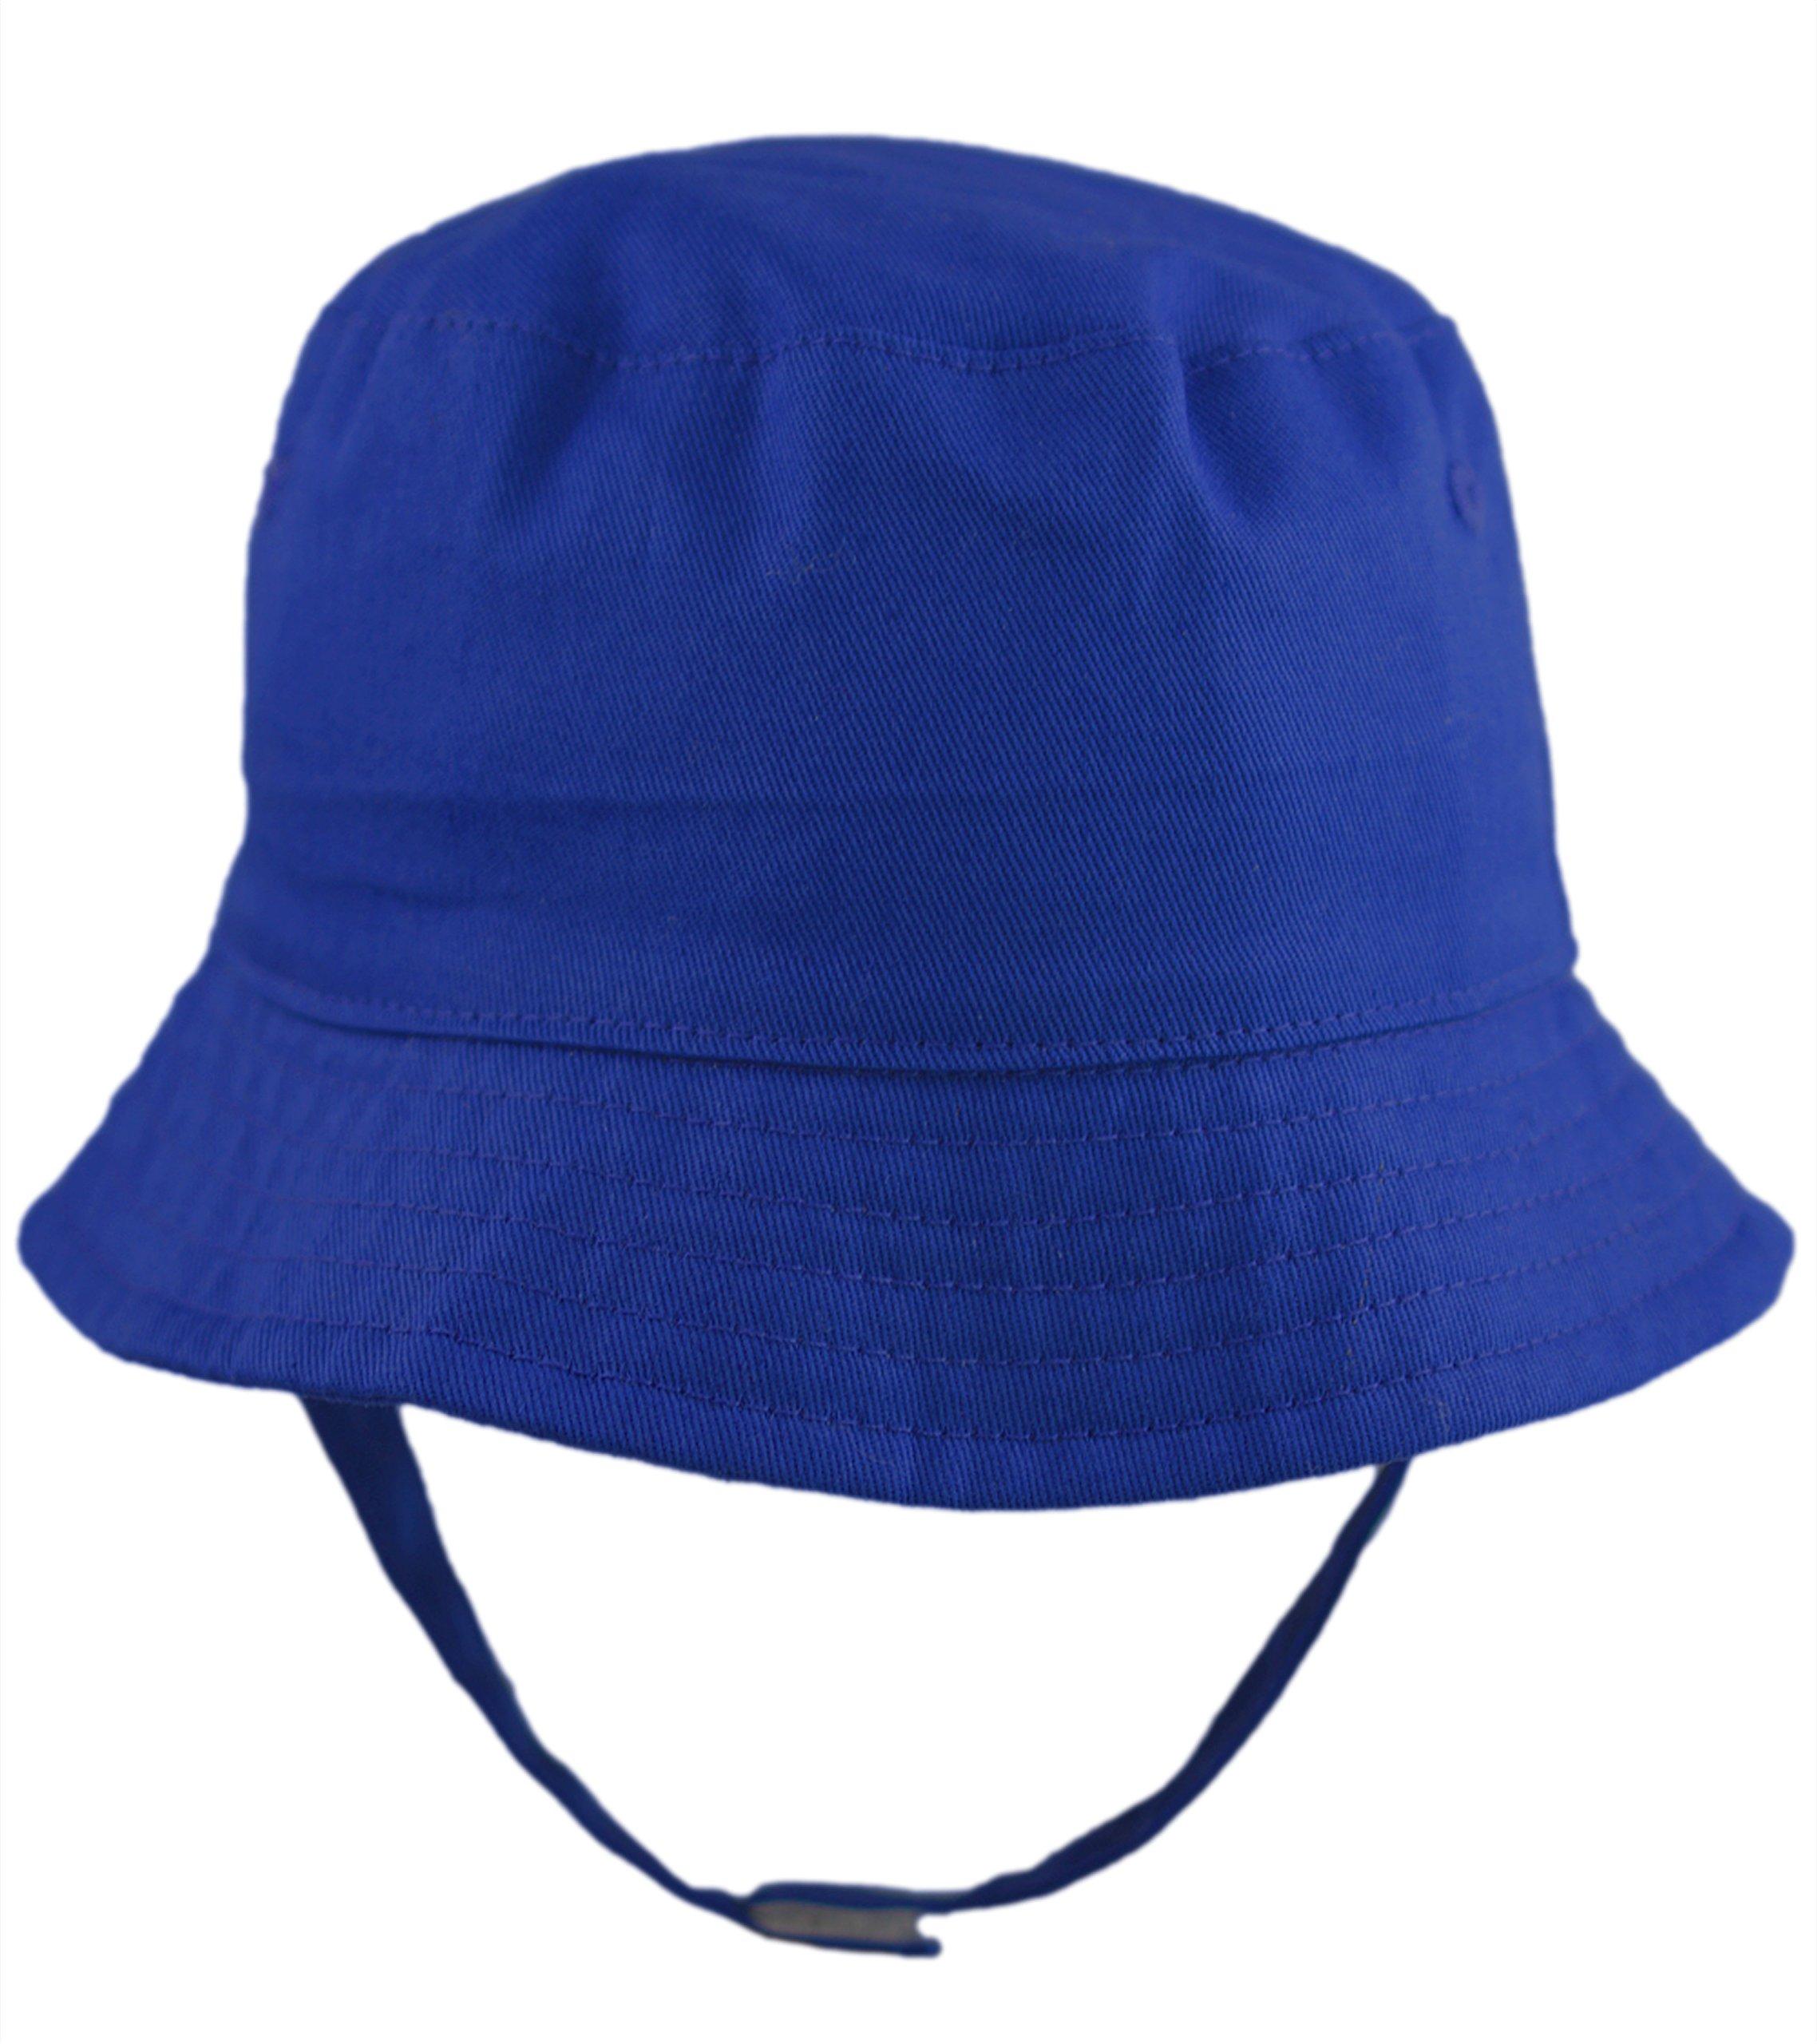 Pesci Baby Boys Girls Sun Hat Summer Bucket Hats with Chin Strap